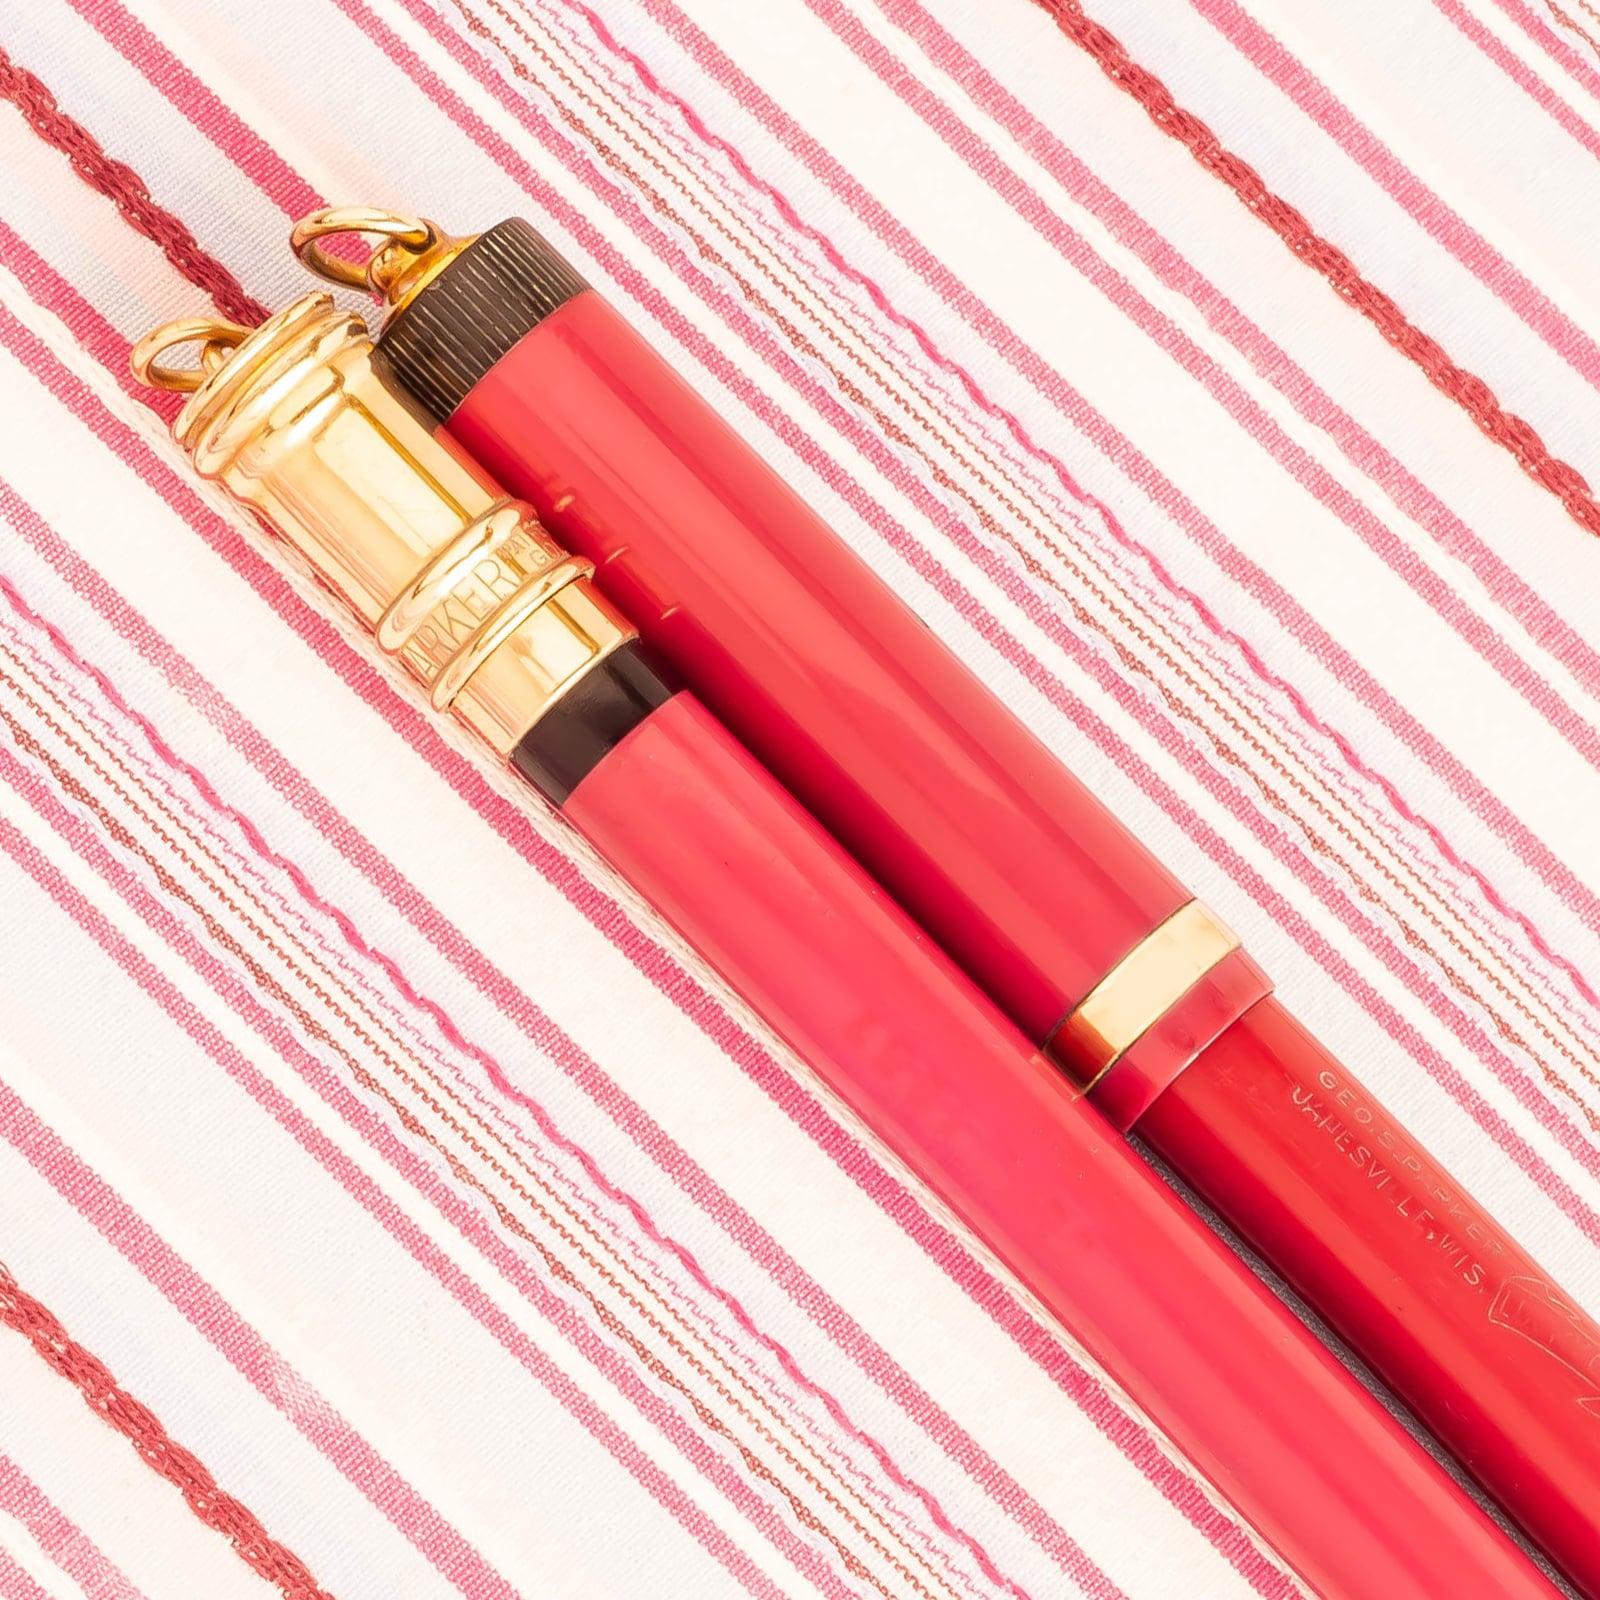 Vintage PARKER Duofold Lucky Curve Pastel Magenta Fountain Pen Pencil Set